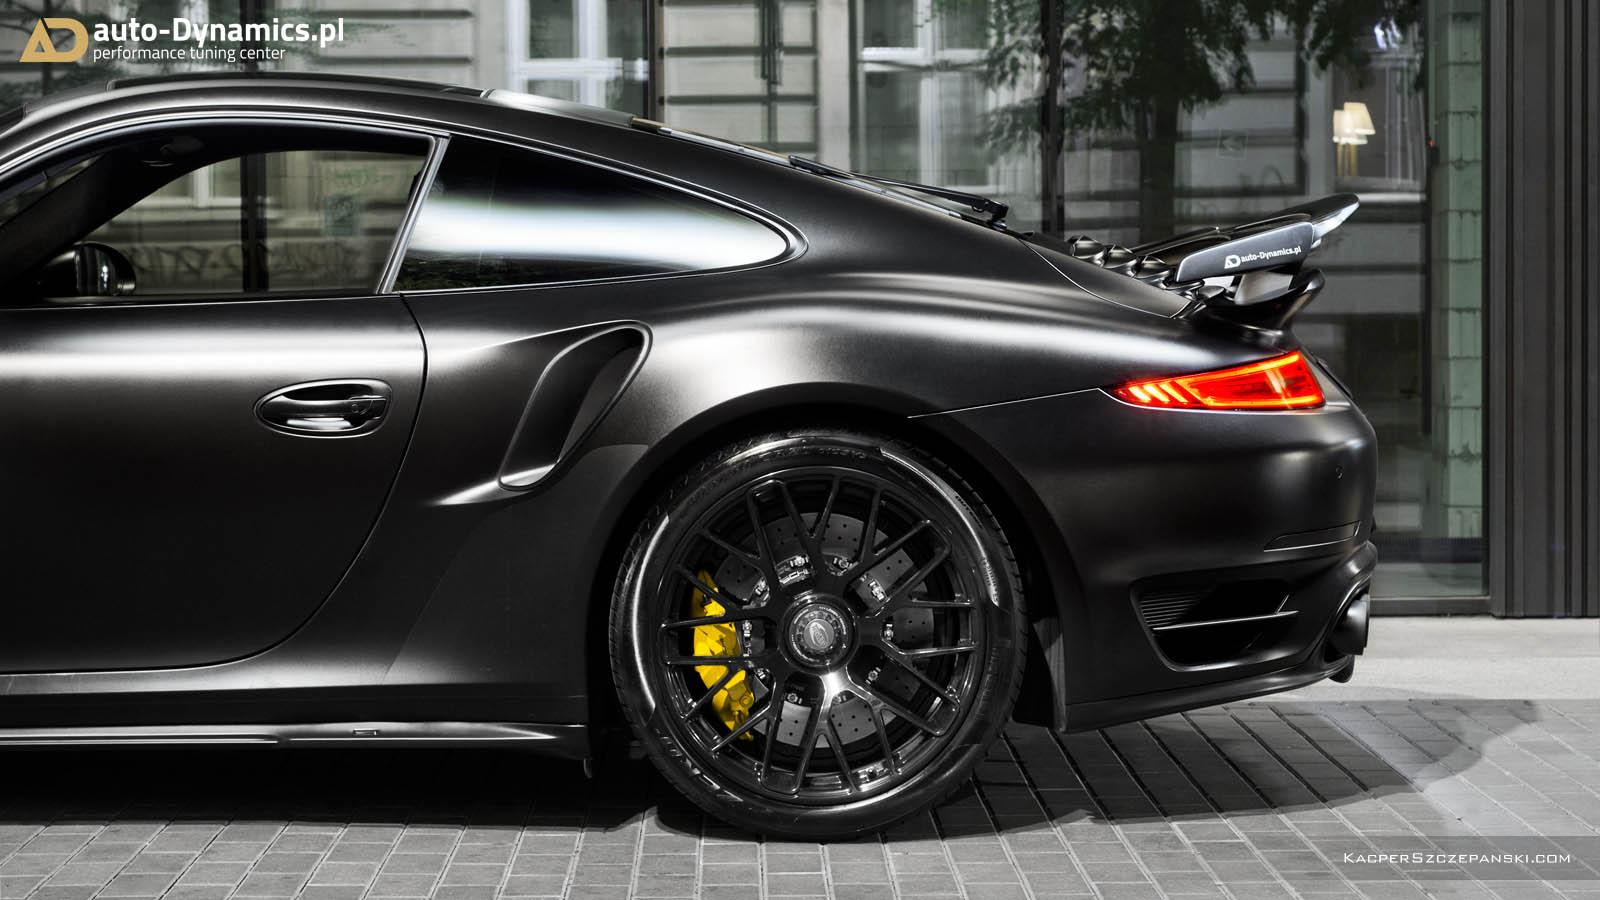 Porsche 911 Turbo S by Auto-Dynamics (15)